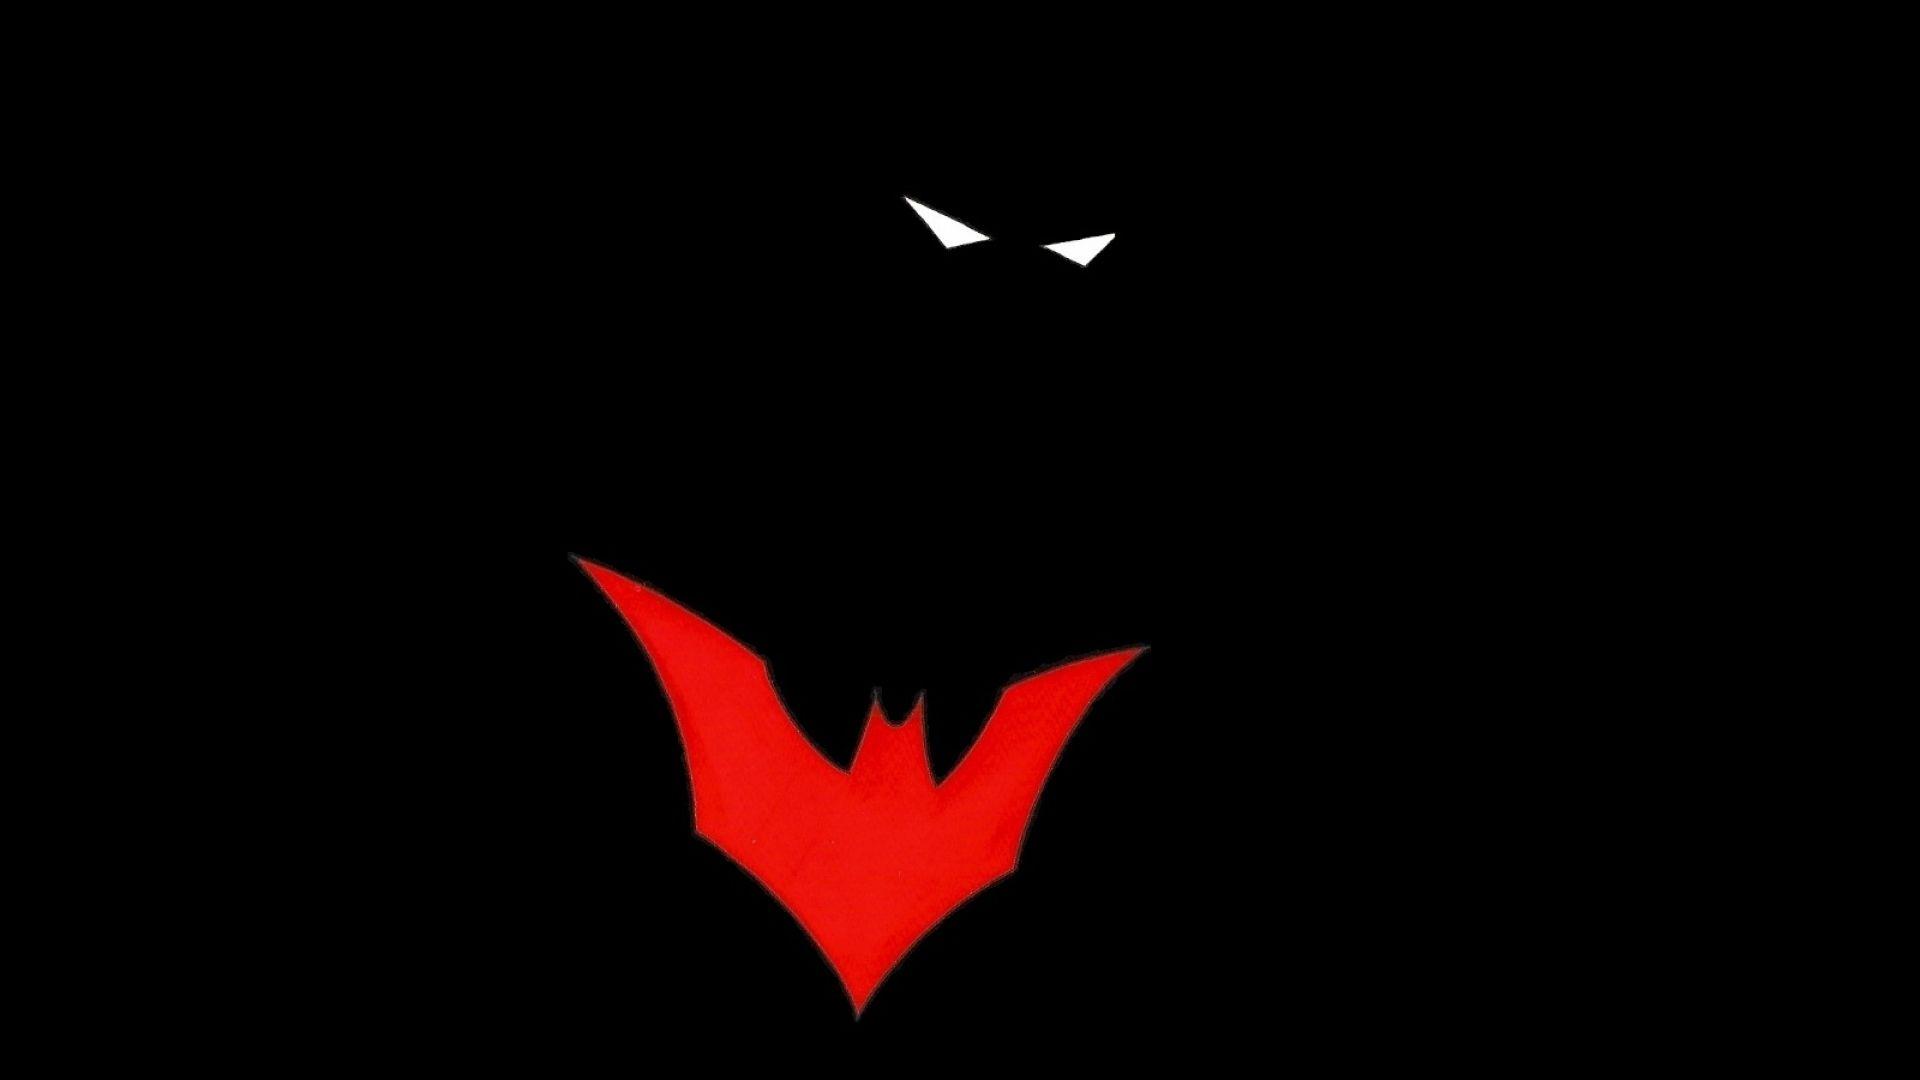 Batman Beyond Two Can Use Photoshop But Paint Still Did8230 1600x900 Wallpaper Art Hd Wallpaper Batman Beyond Wallpaper But Painting